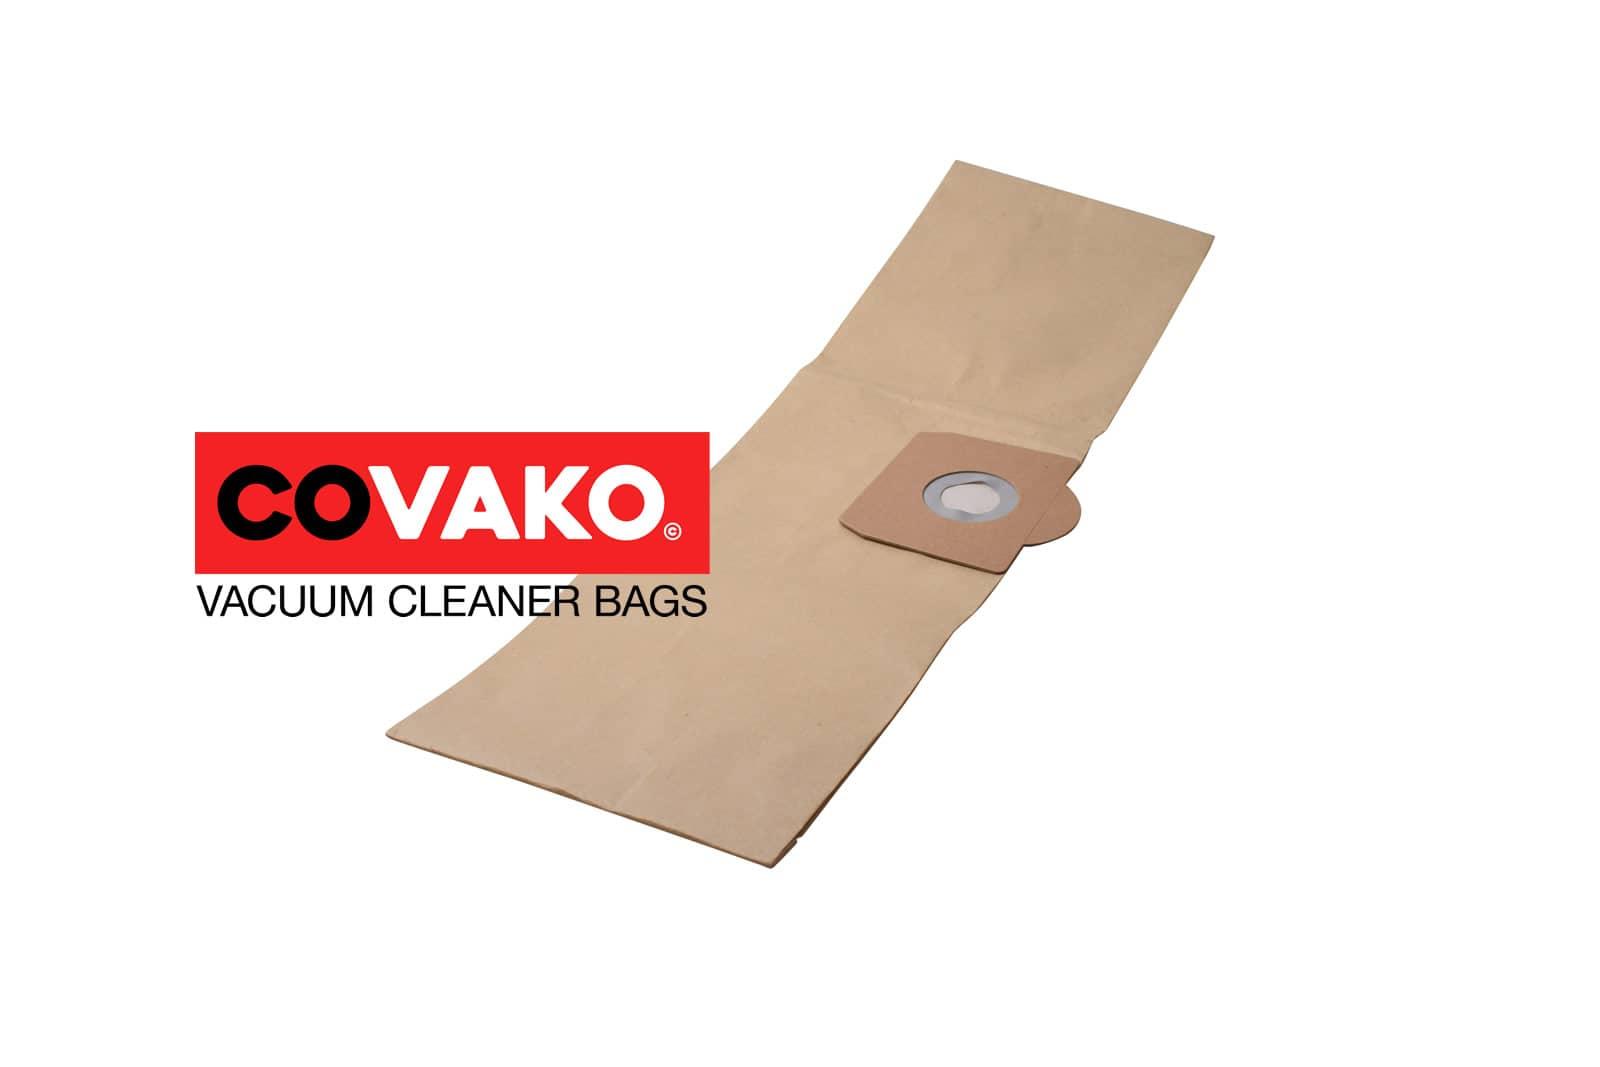 Hevo BF 570 / Papier - Hevo sacs d'aspirateur